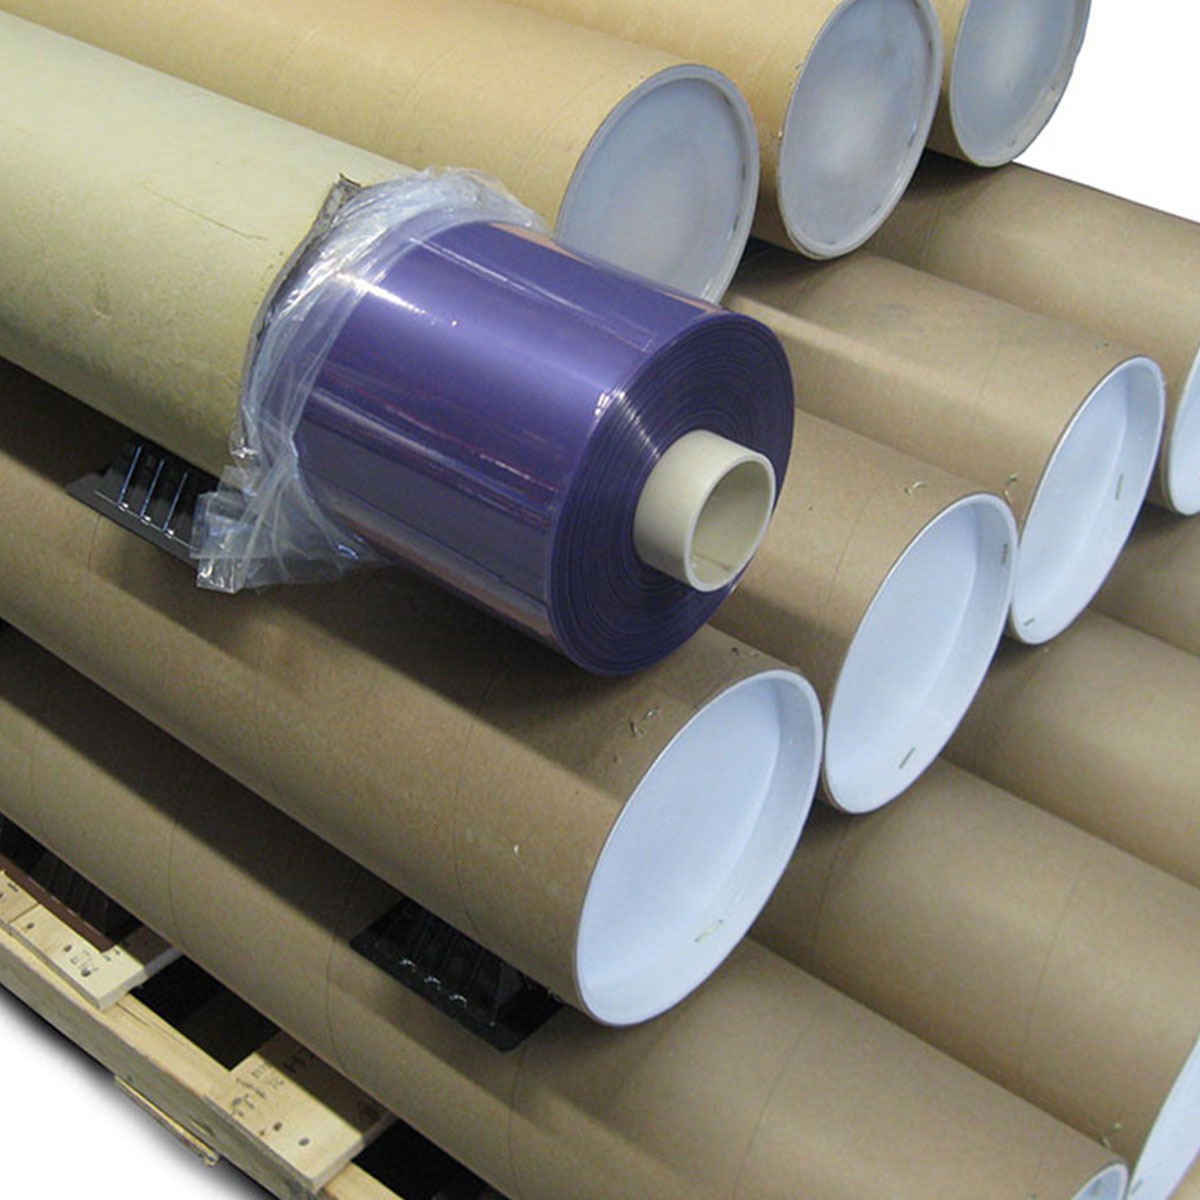 vacuum bag nylon 2300 purple 0076mm x 2300mm 42366m 0003 x 90